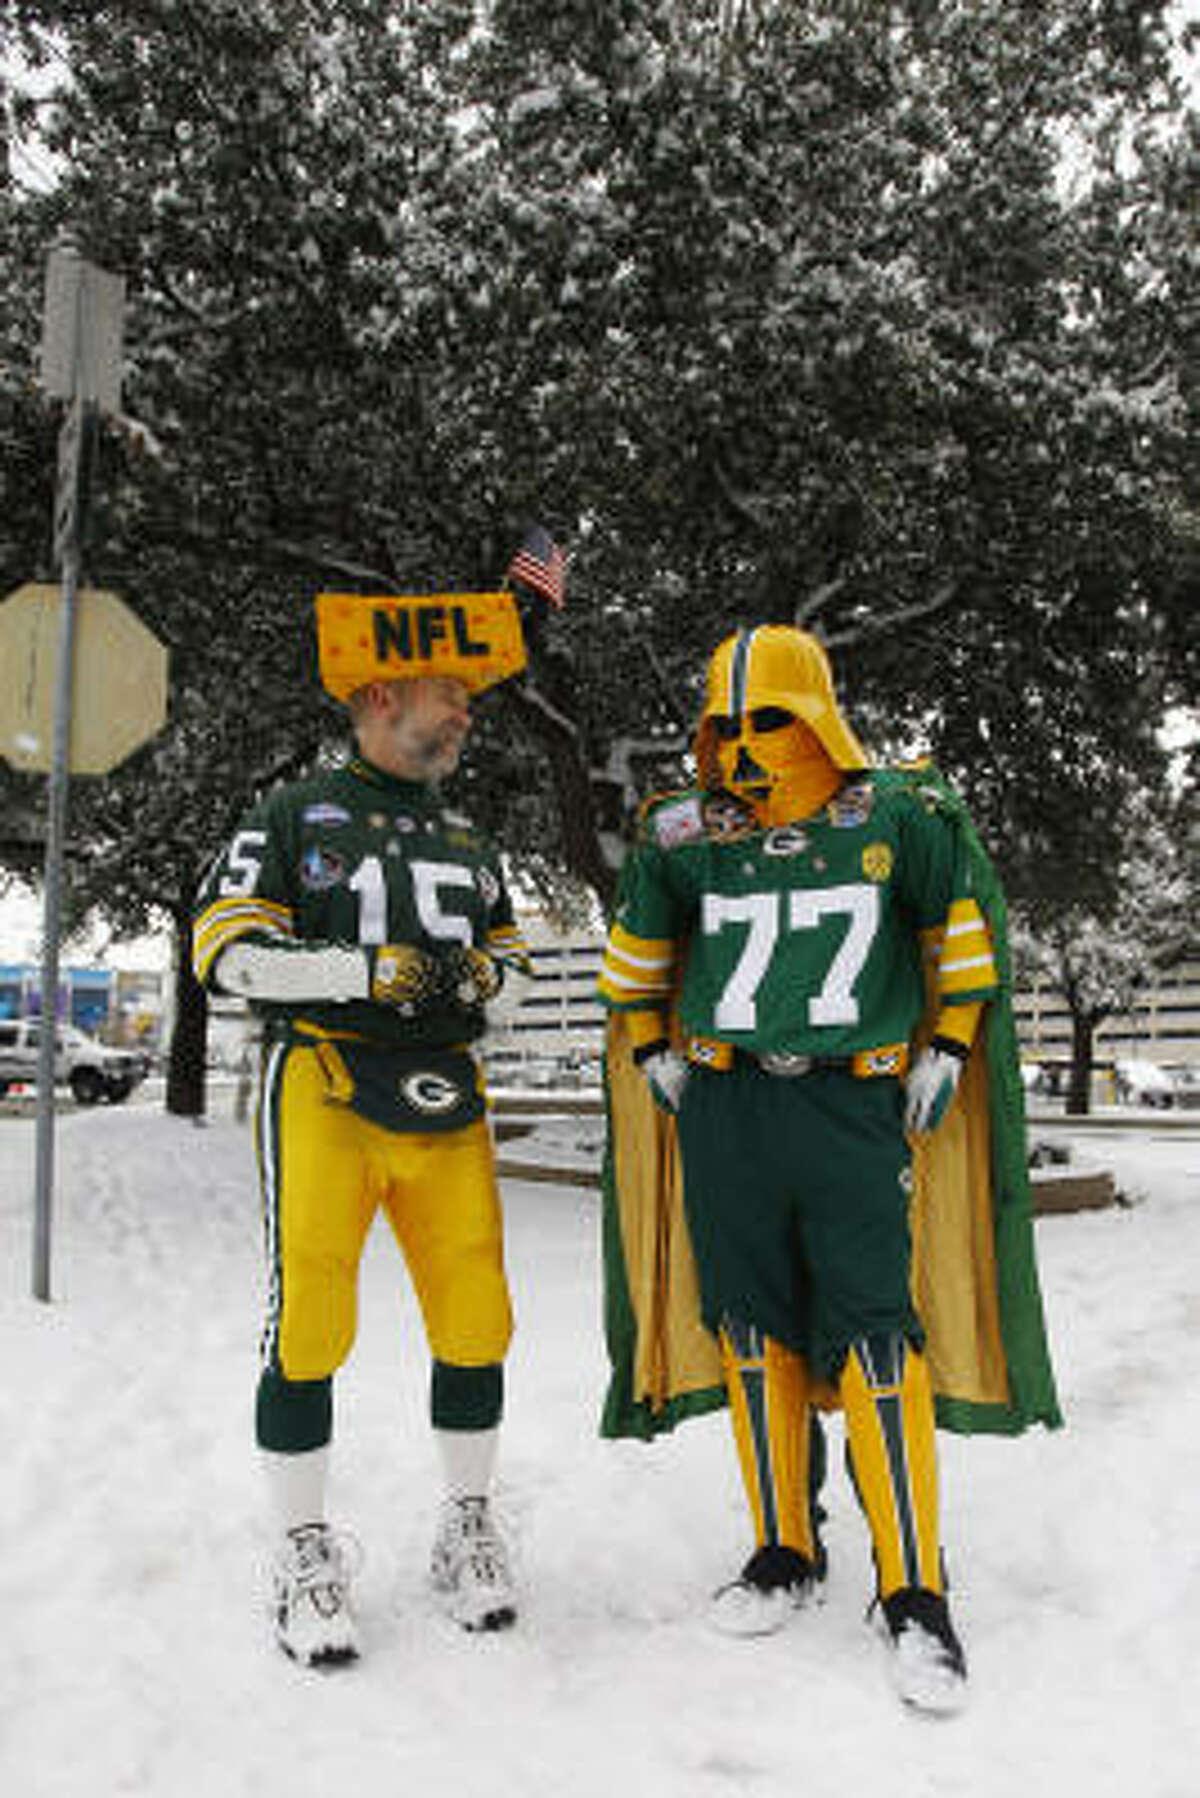 Green Bay Packers fans Steve Tate, left, and Adam Dillman wait to cross a snowy street near the Super Bowl Media Center.